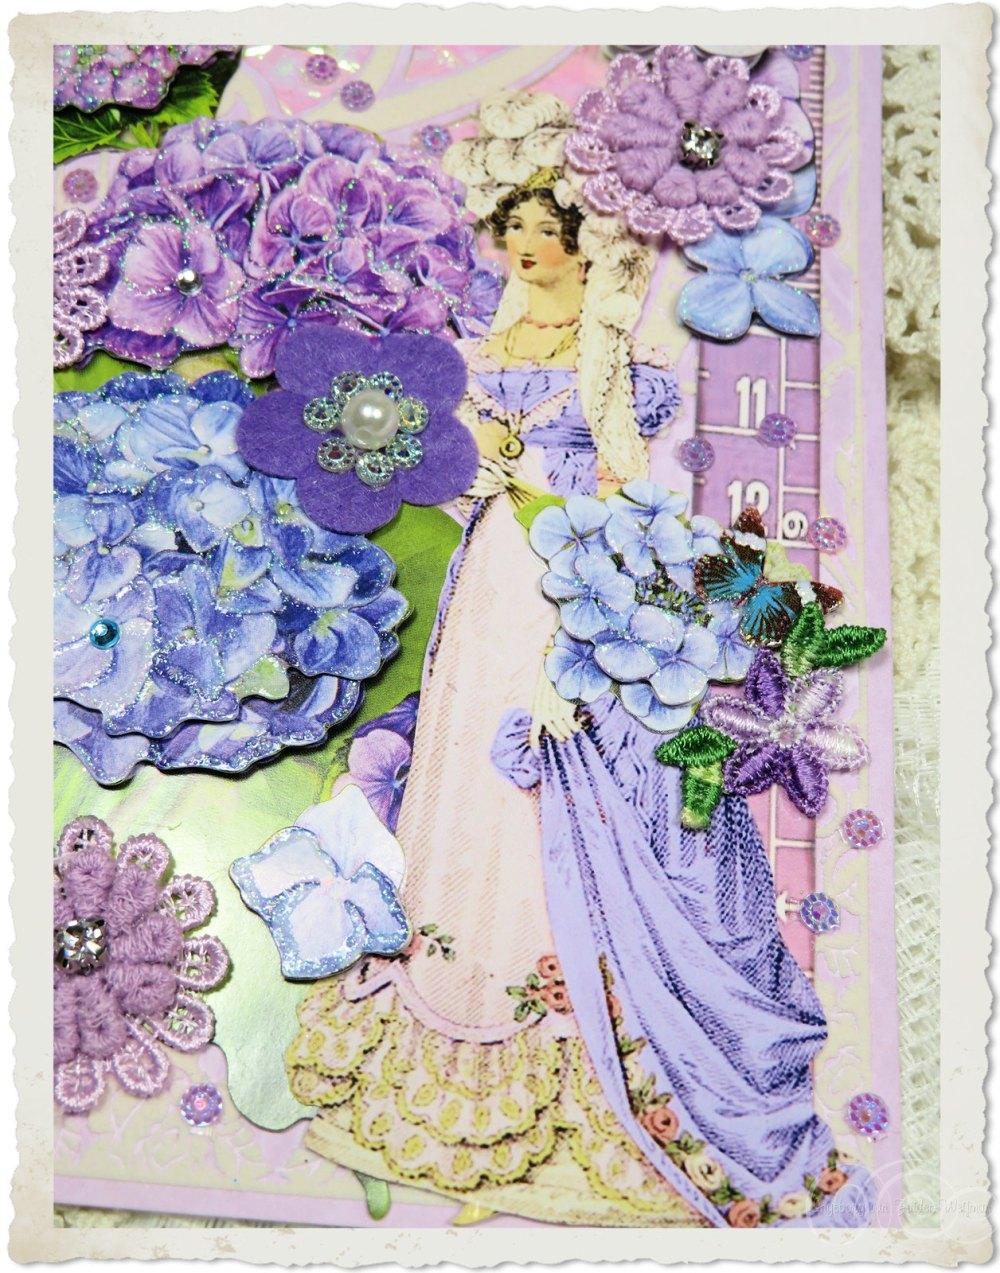 Regency lady with flowers